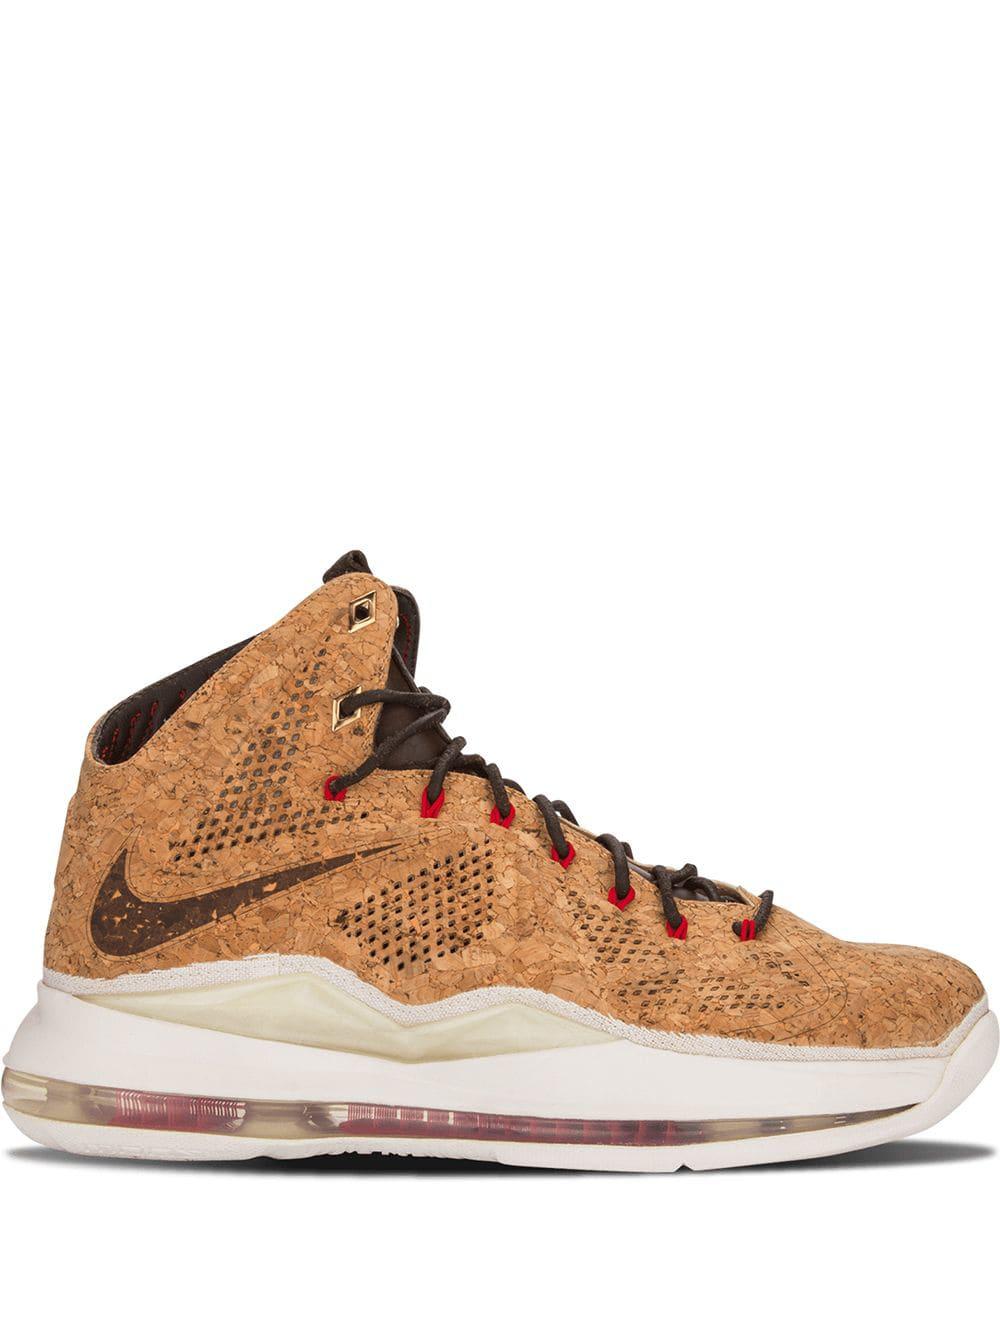 size 40 62f7e 05b62 Nike Lebron 10 Ext Cork Qs Sneakers - Brown